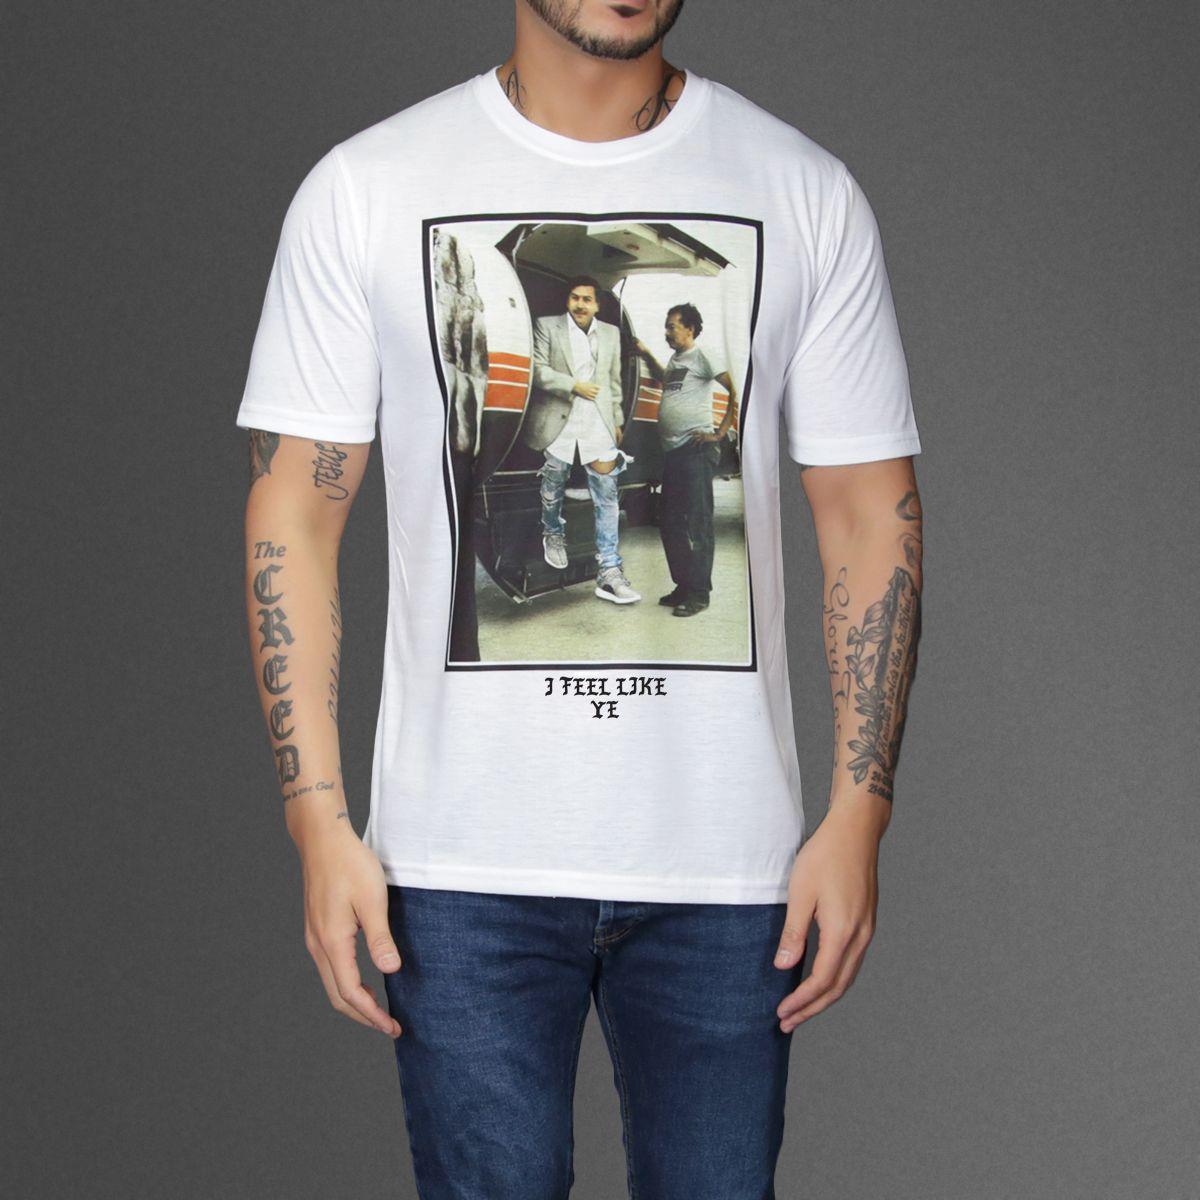 80b037ed9 I feel Like Ye - Pablo Escobar T-Shirt | SHIRT SAUCE | Pablo escobar ...